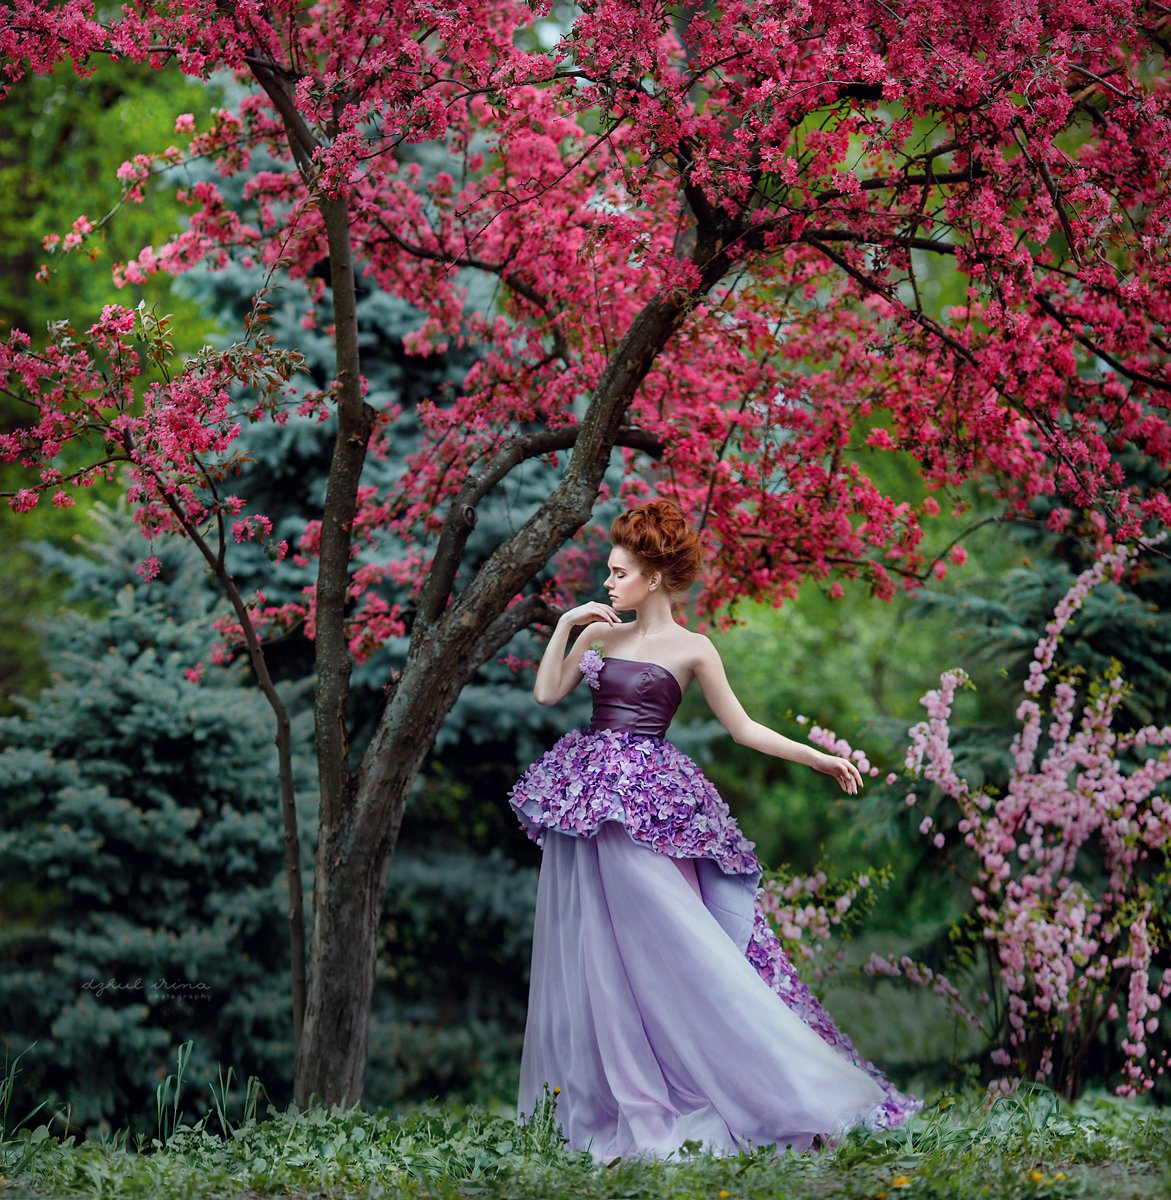 Colors, Dress, Dzhul irina, Flower, Girl, Green, Irinadzhul, People, Portrait, Red, Ирина Джуль